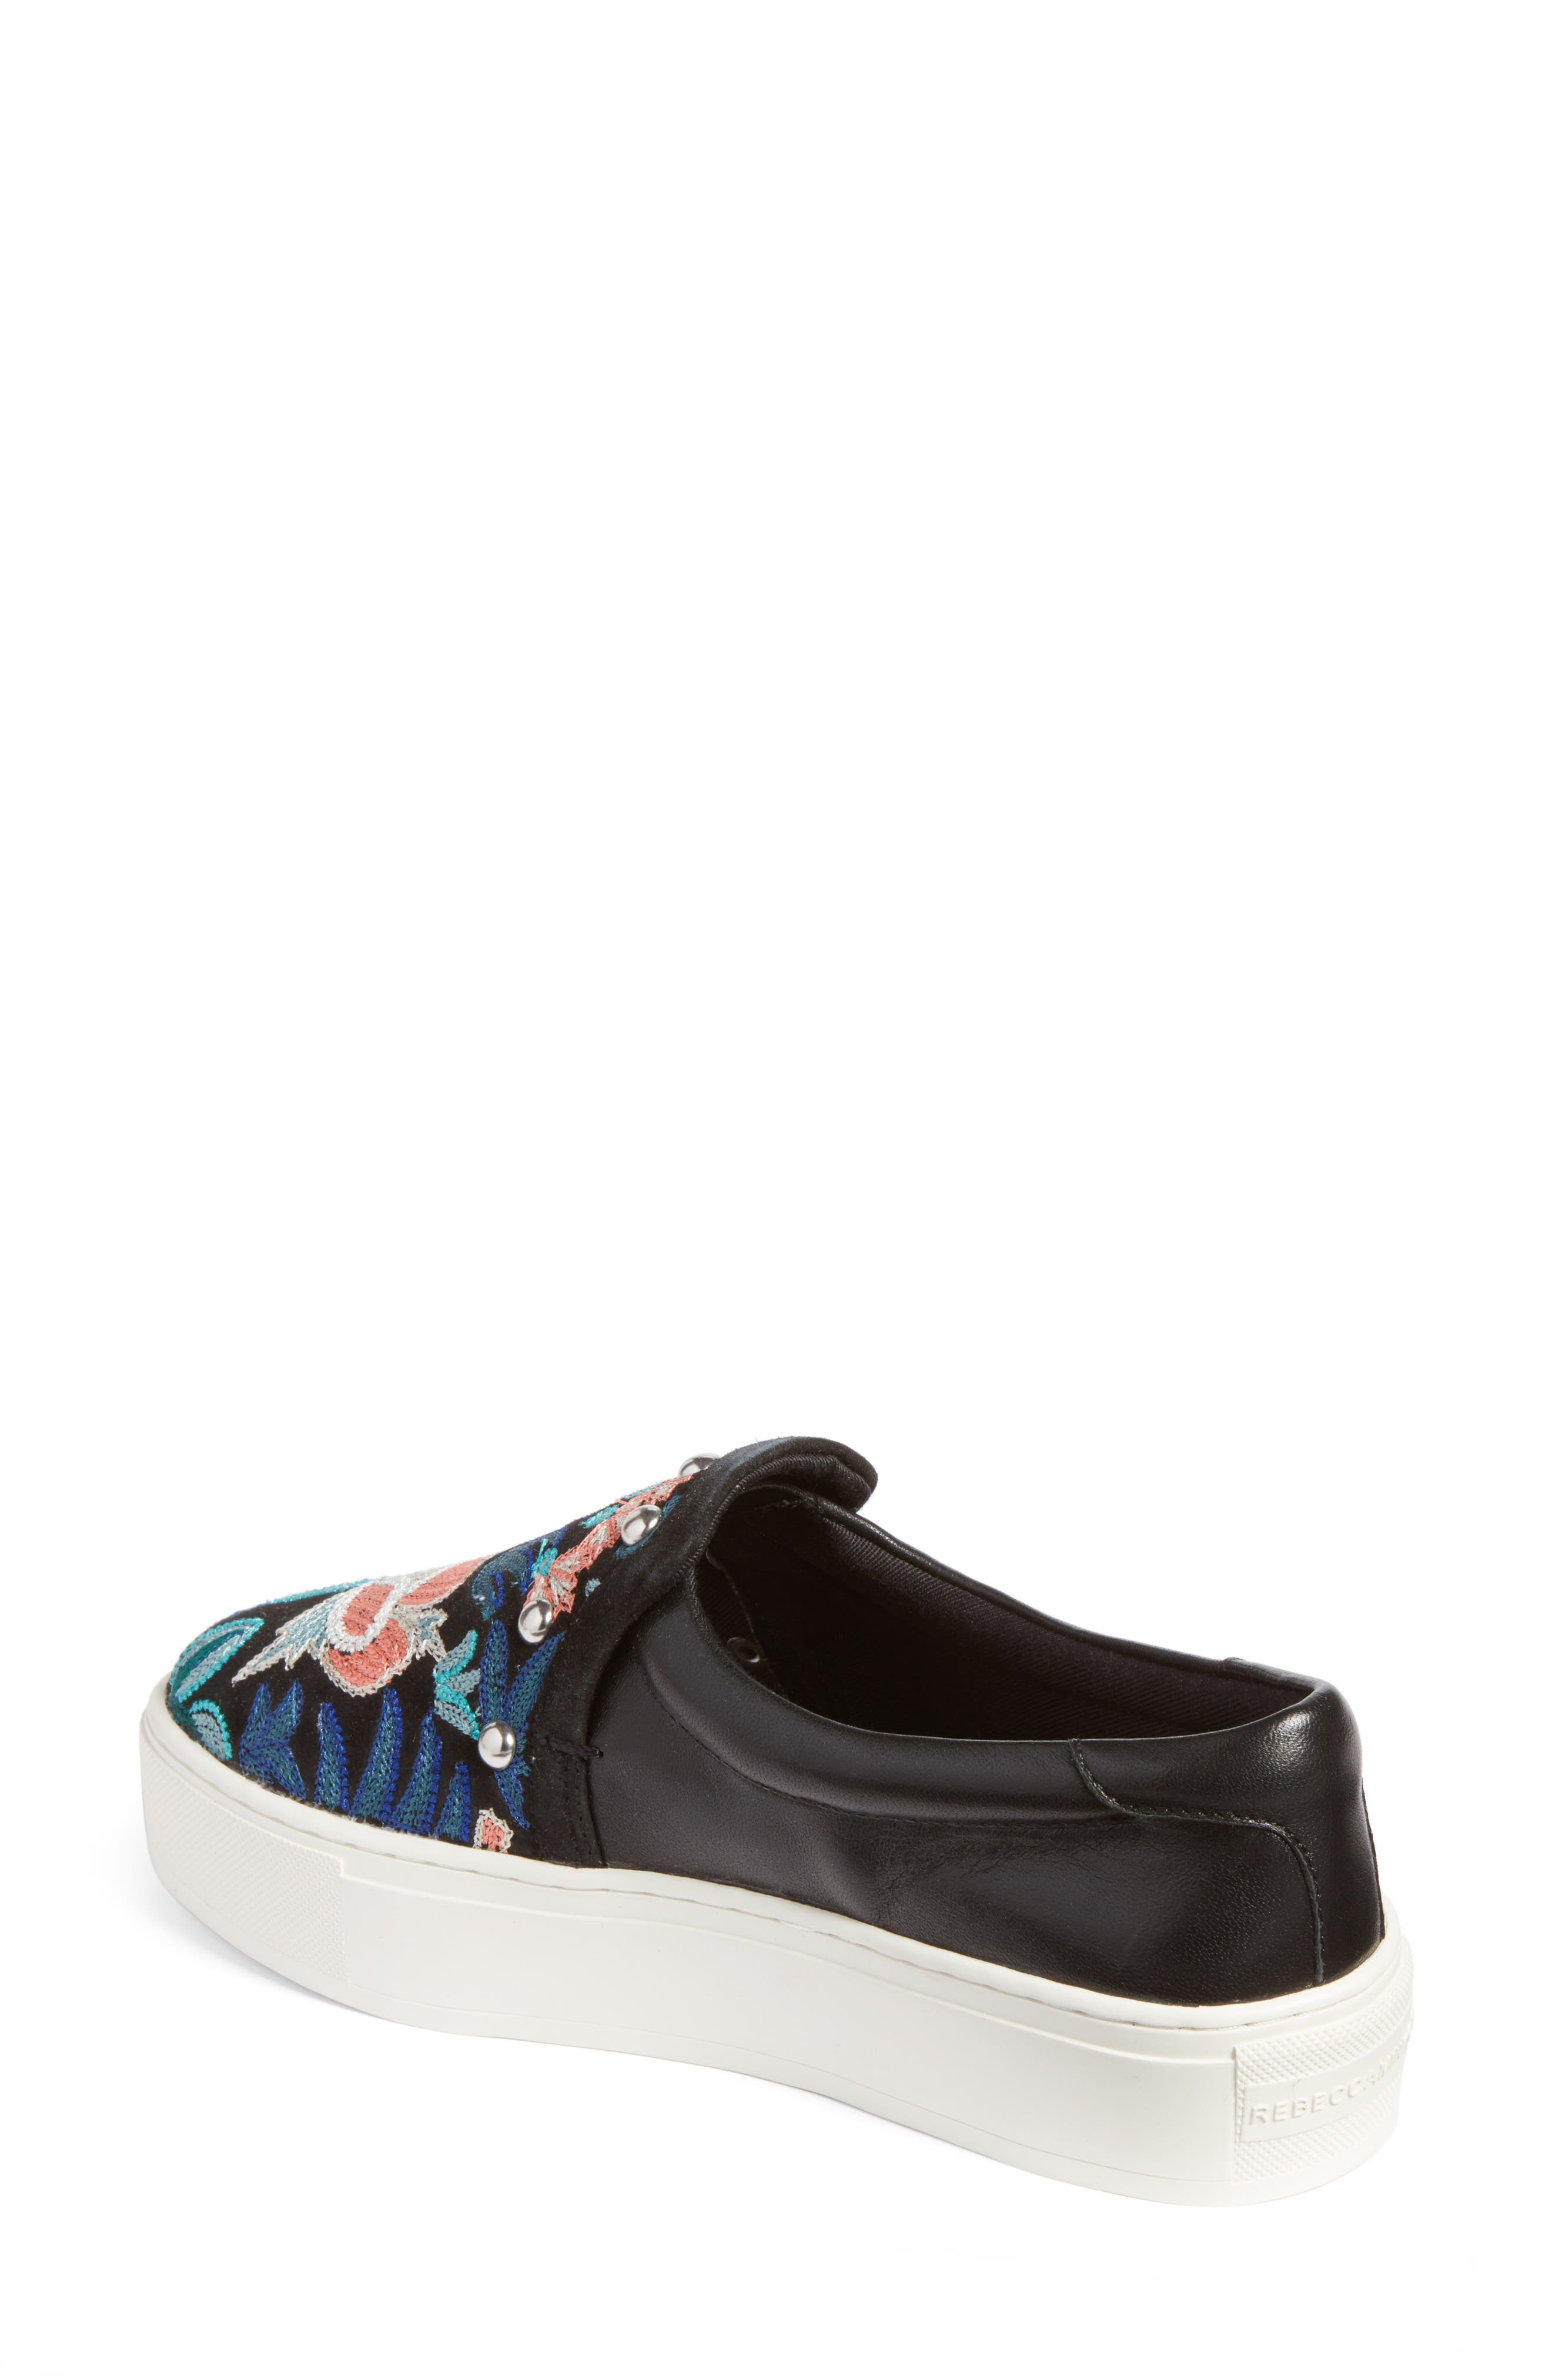 Alternate Image 2  - Rebecca Minkoff Noelle Embellished Slip-On Platform Sneaker (Women)